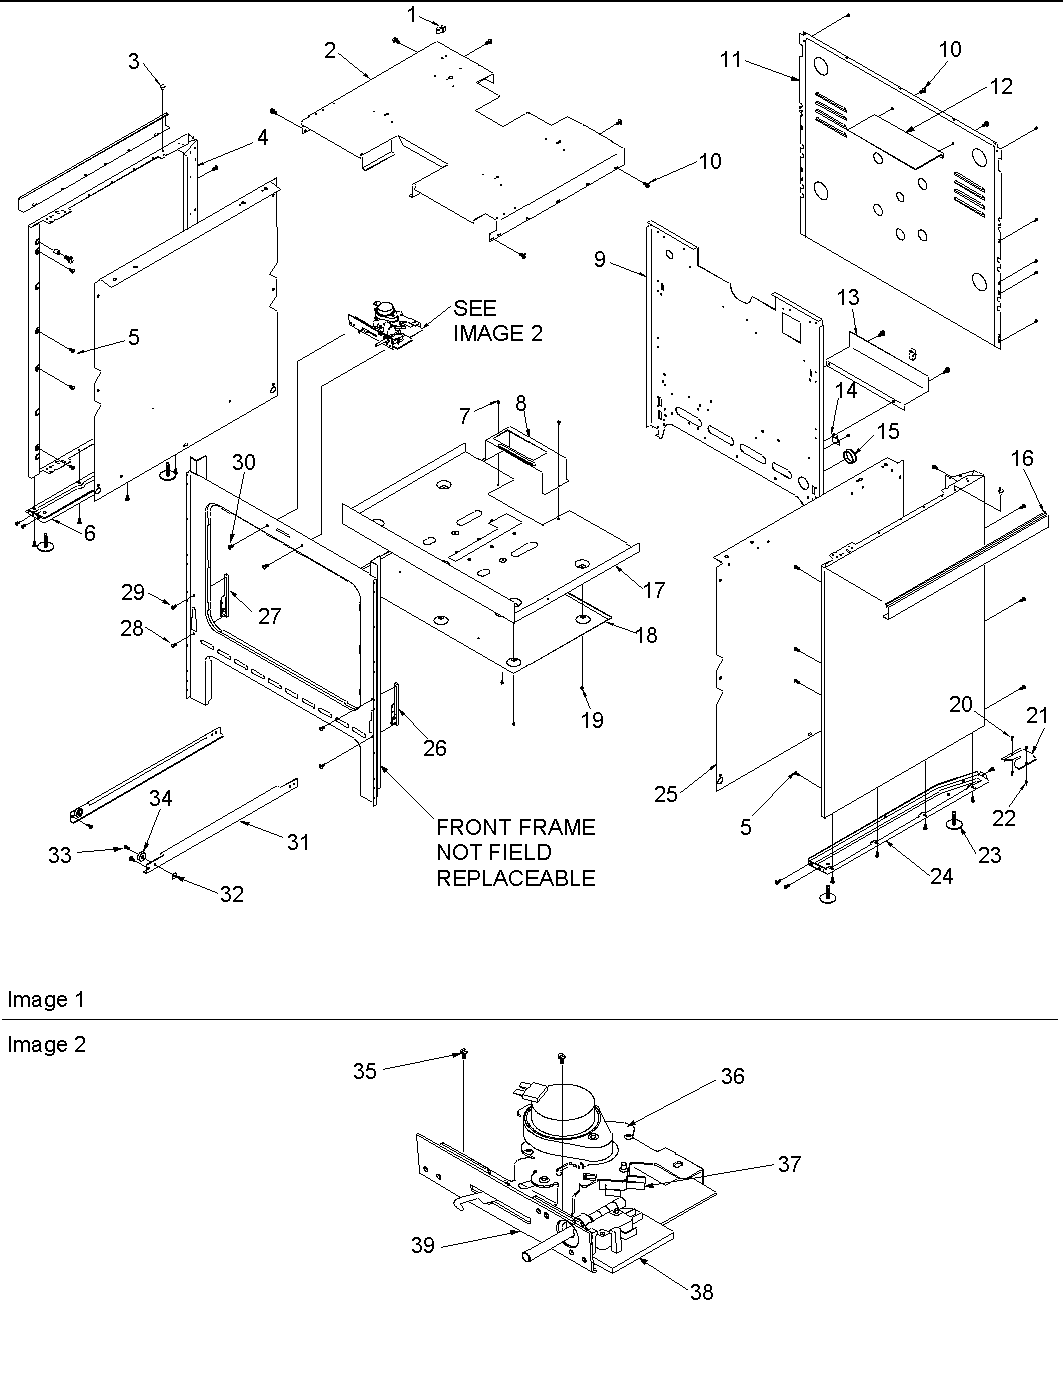 sears coldspot manual auto electrical wiring diagram Dodge Ram 2500 Wiring Diagram